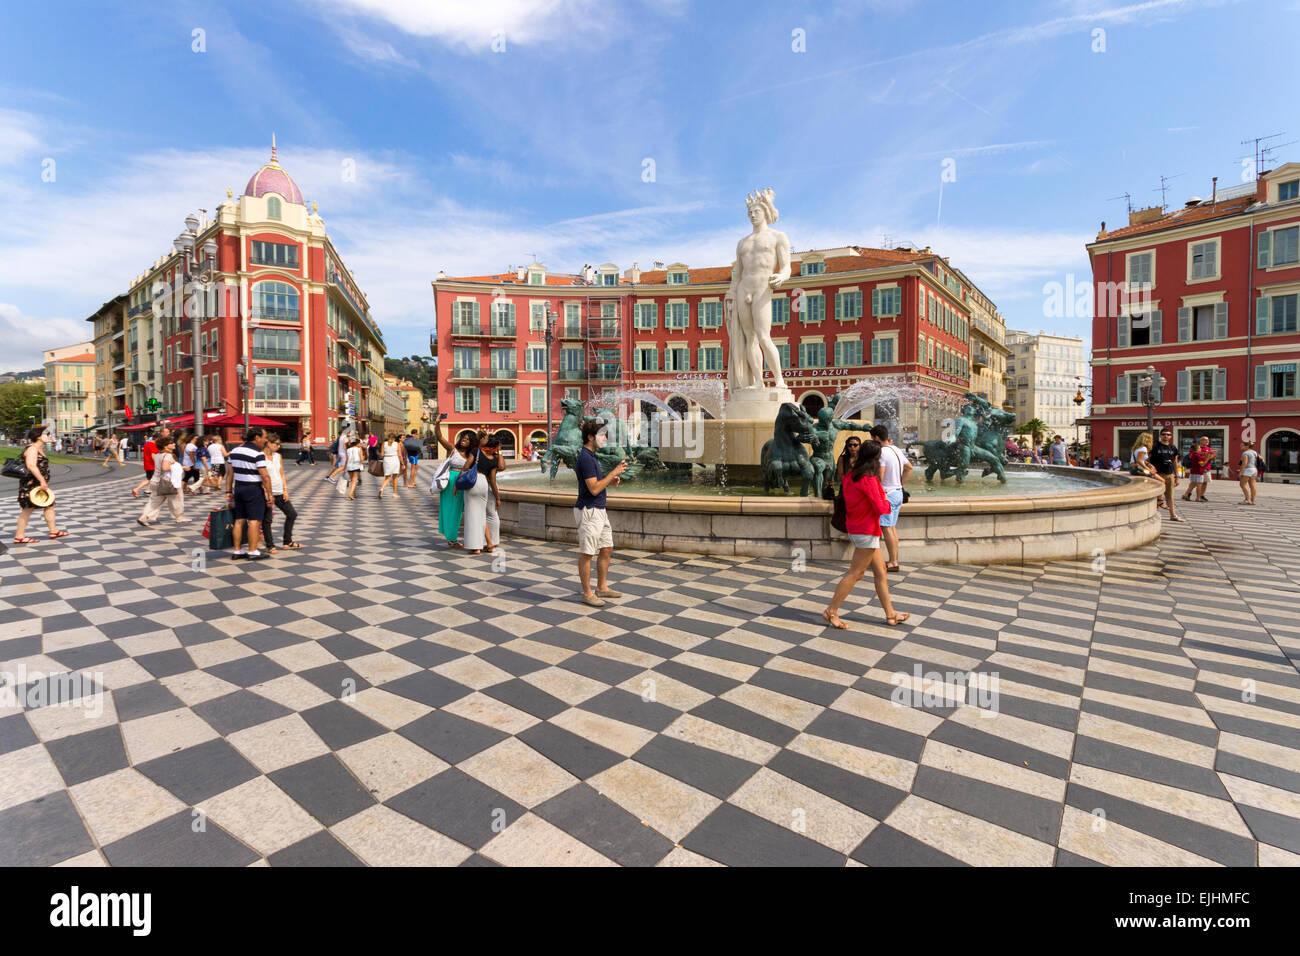 Francia - Cote d'Azur, Nizza, Piazza Massena Foto Stock